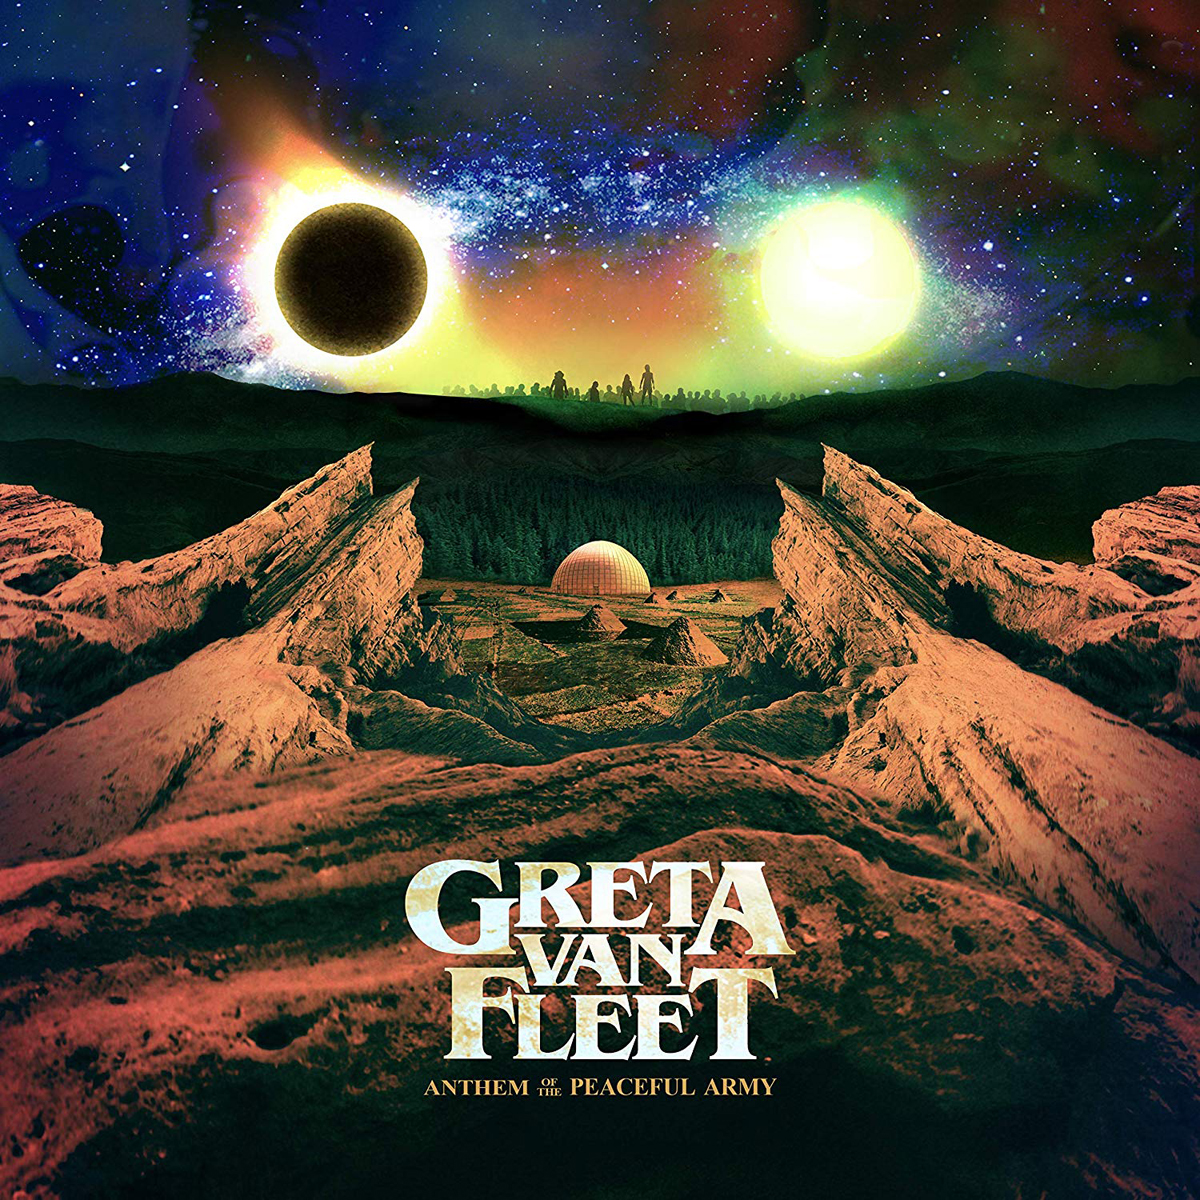 Greta Van Fleet Greta Van Fleet. Anthem Of The Peaceful Army (LP) greta van fleet edmonton